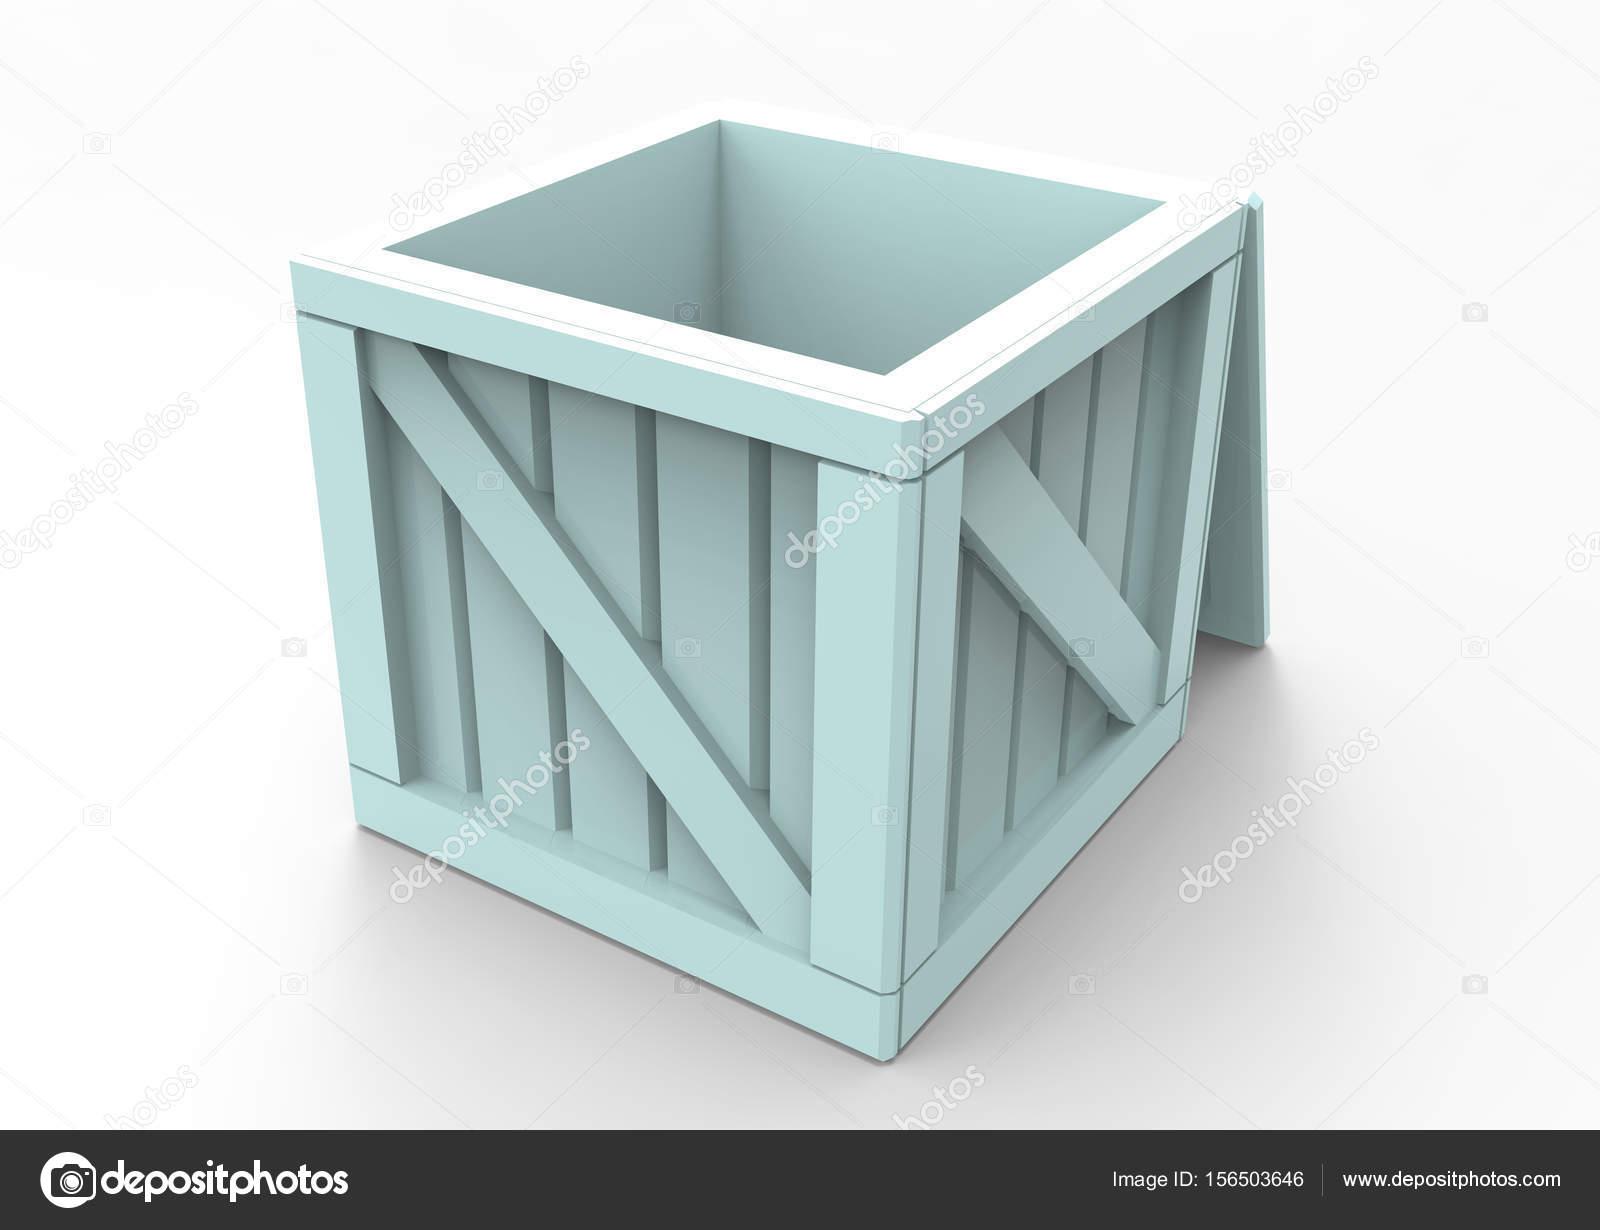 Rahmen aus Holz Box 3d — Stockfoto © blankvoid #156503646